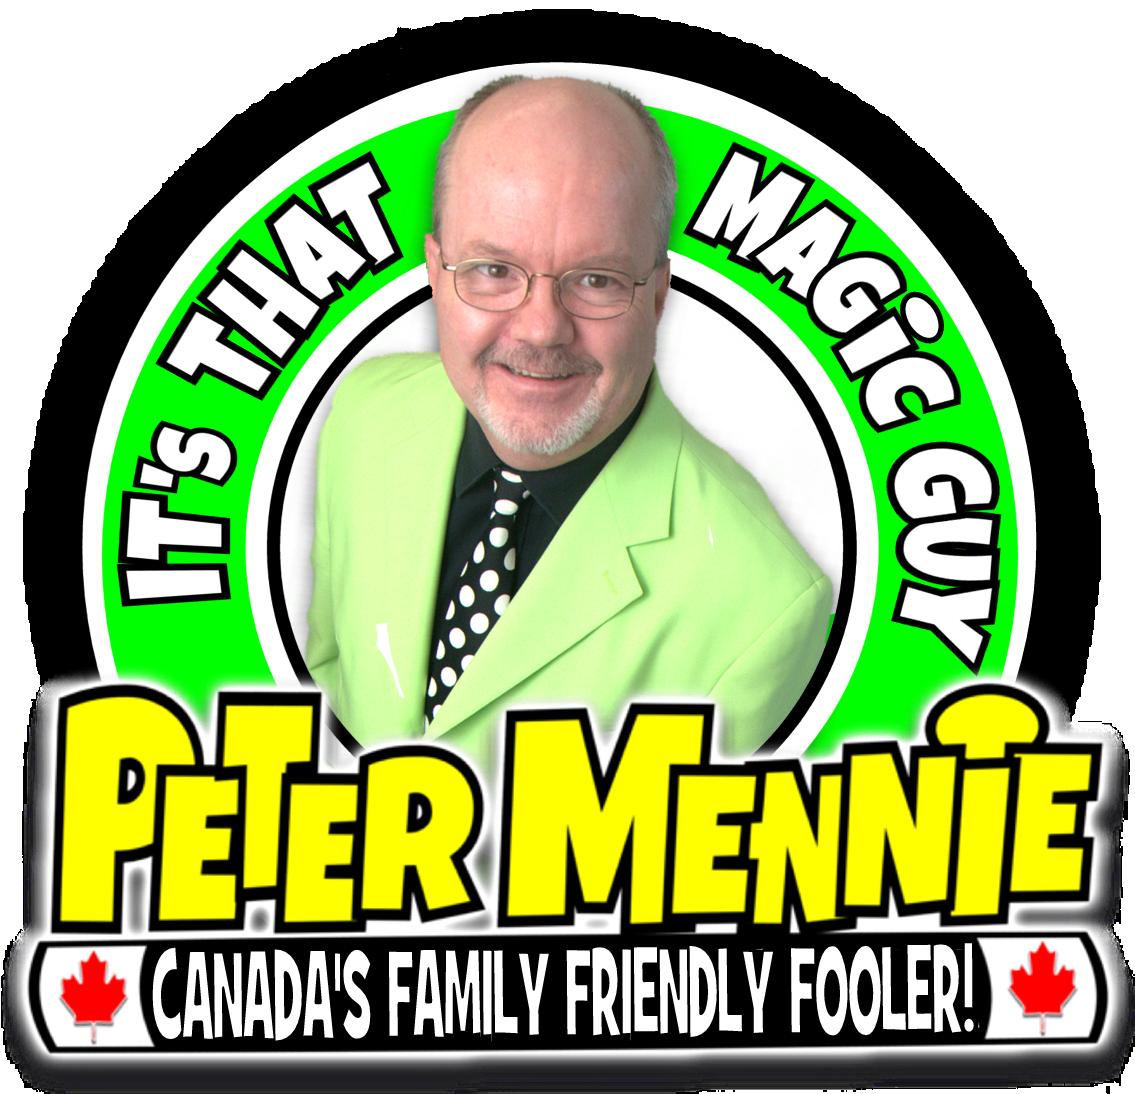 It's That Magic Guy Peter Mennie, Canada's Family Friendly Fooler